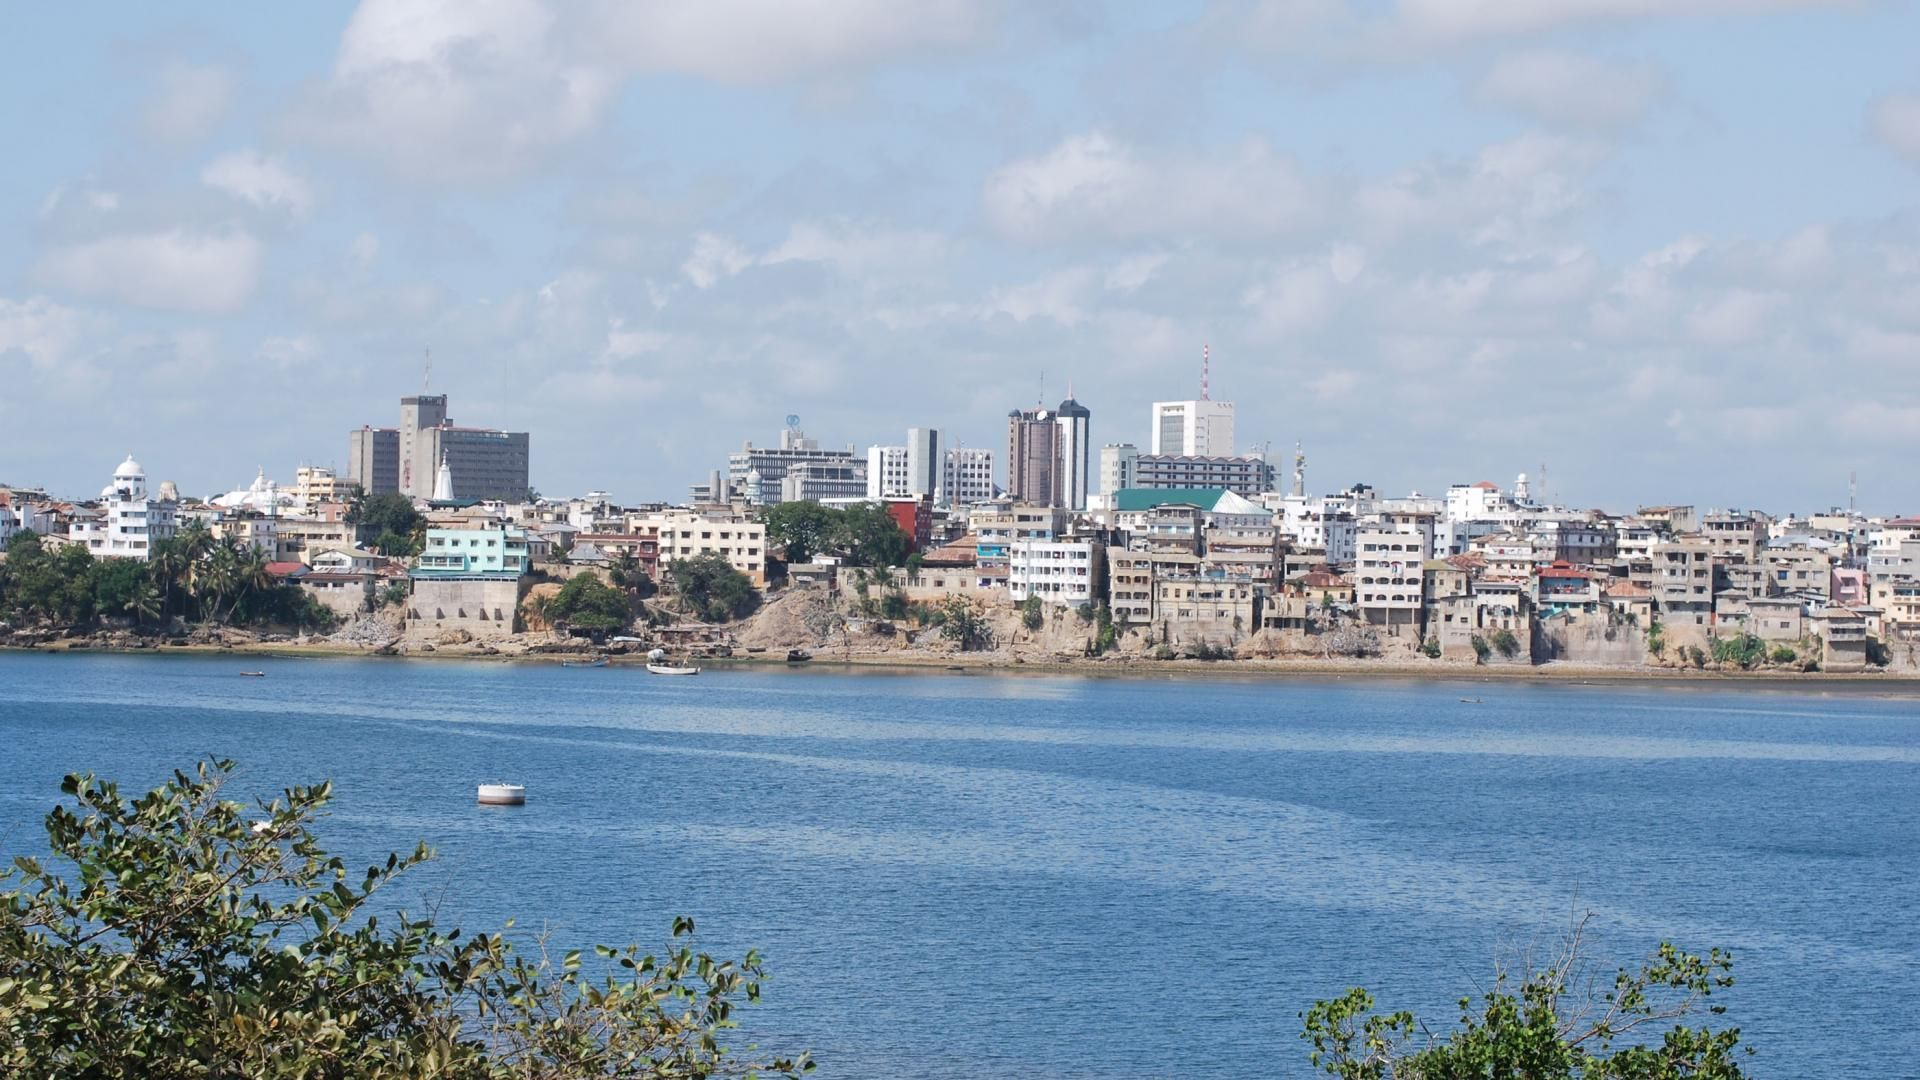 ¿A qué país pertenece Mombasa?